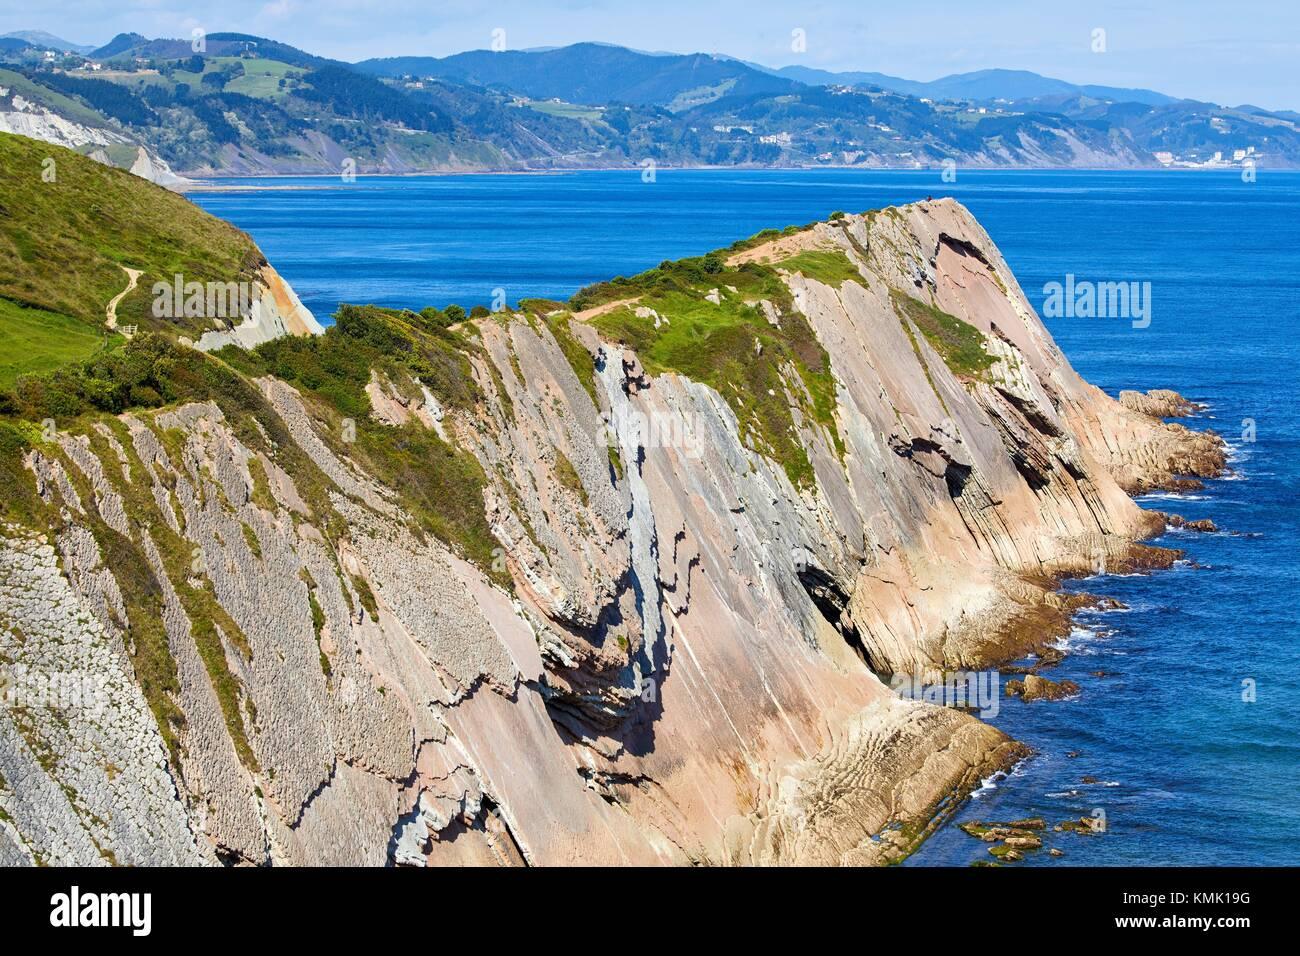 Flysch, tidal platform, Algorri, Zumaia, Gipuzkoa, Basque Country, Spain - Stock Image